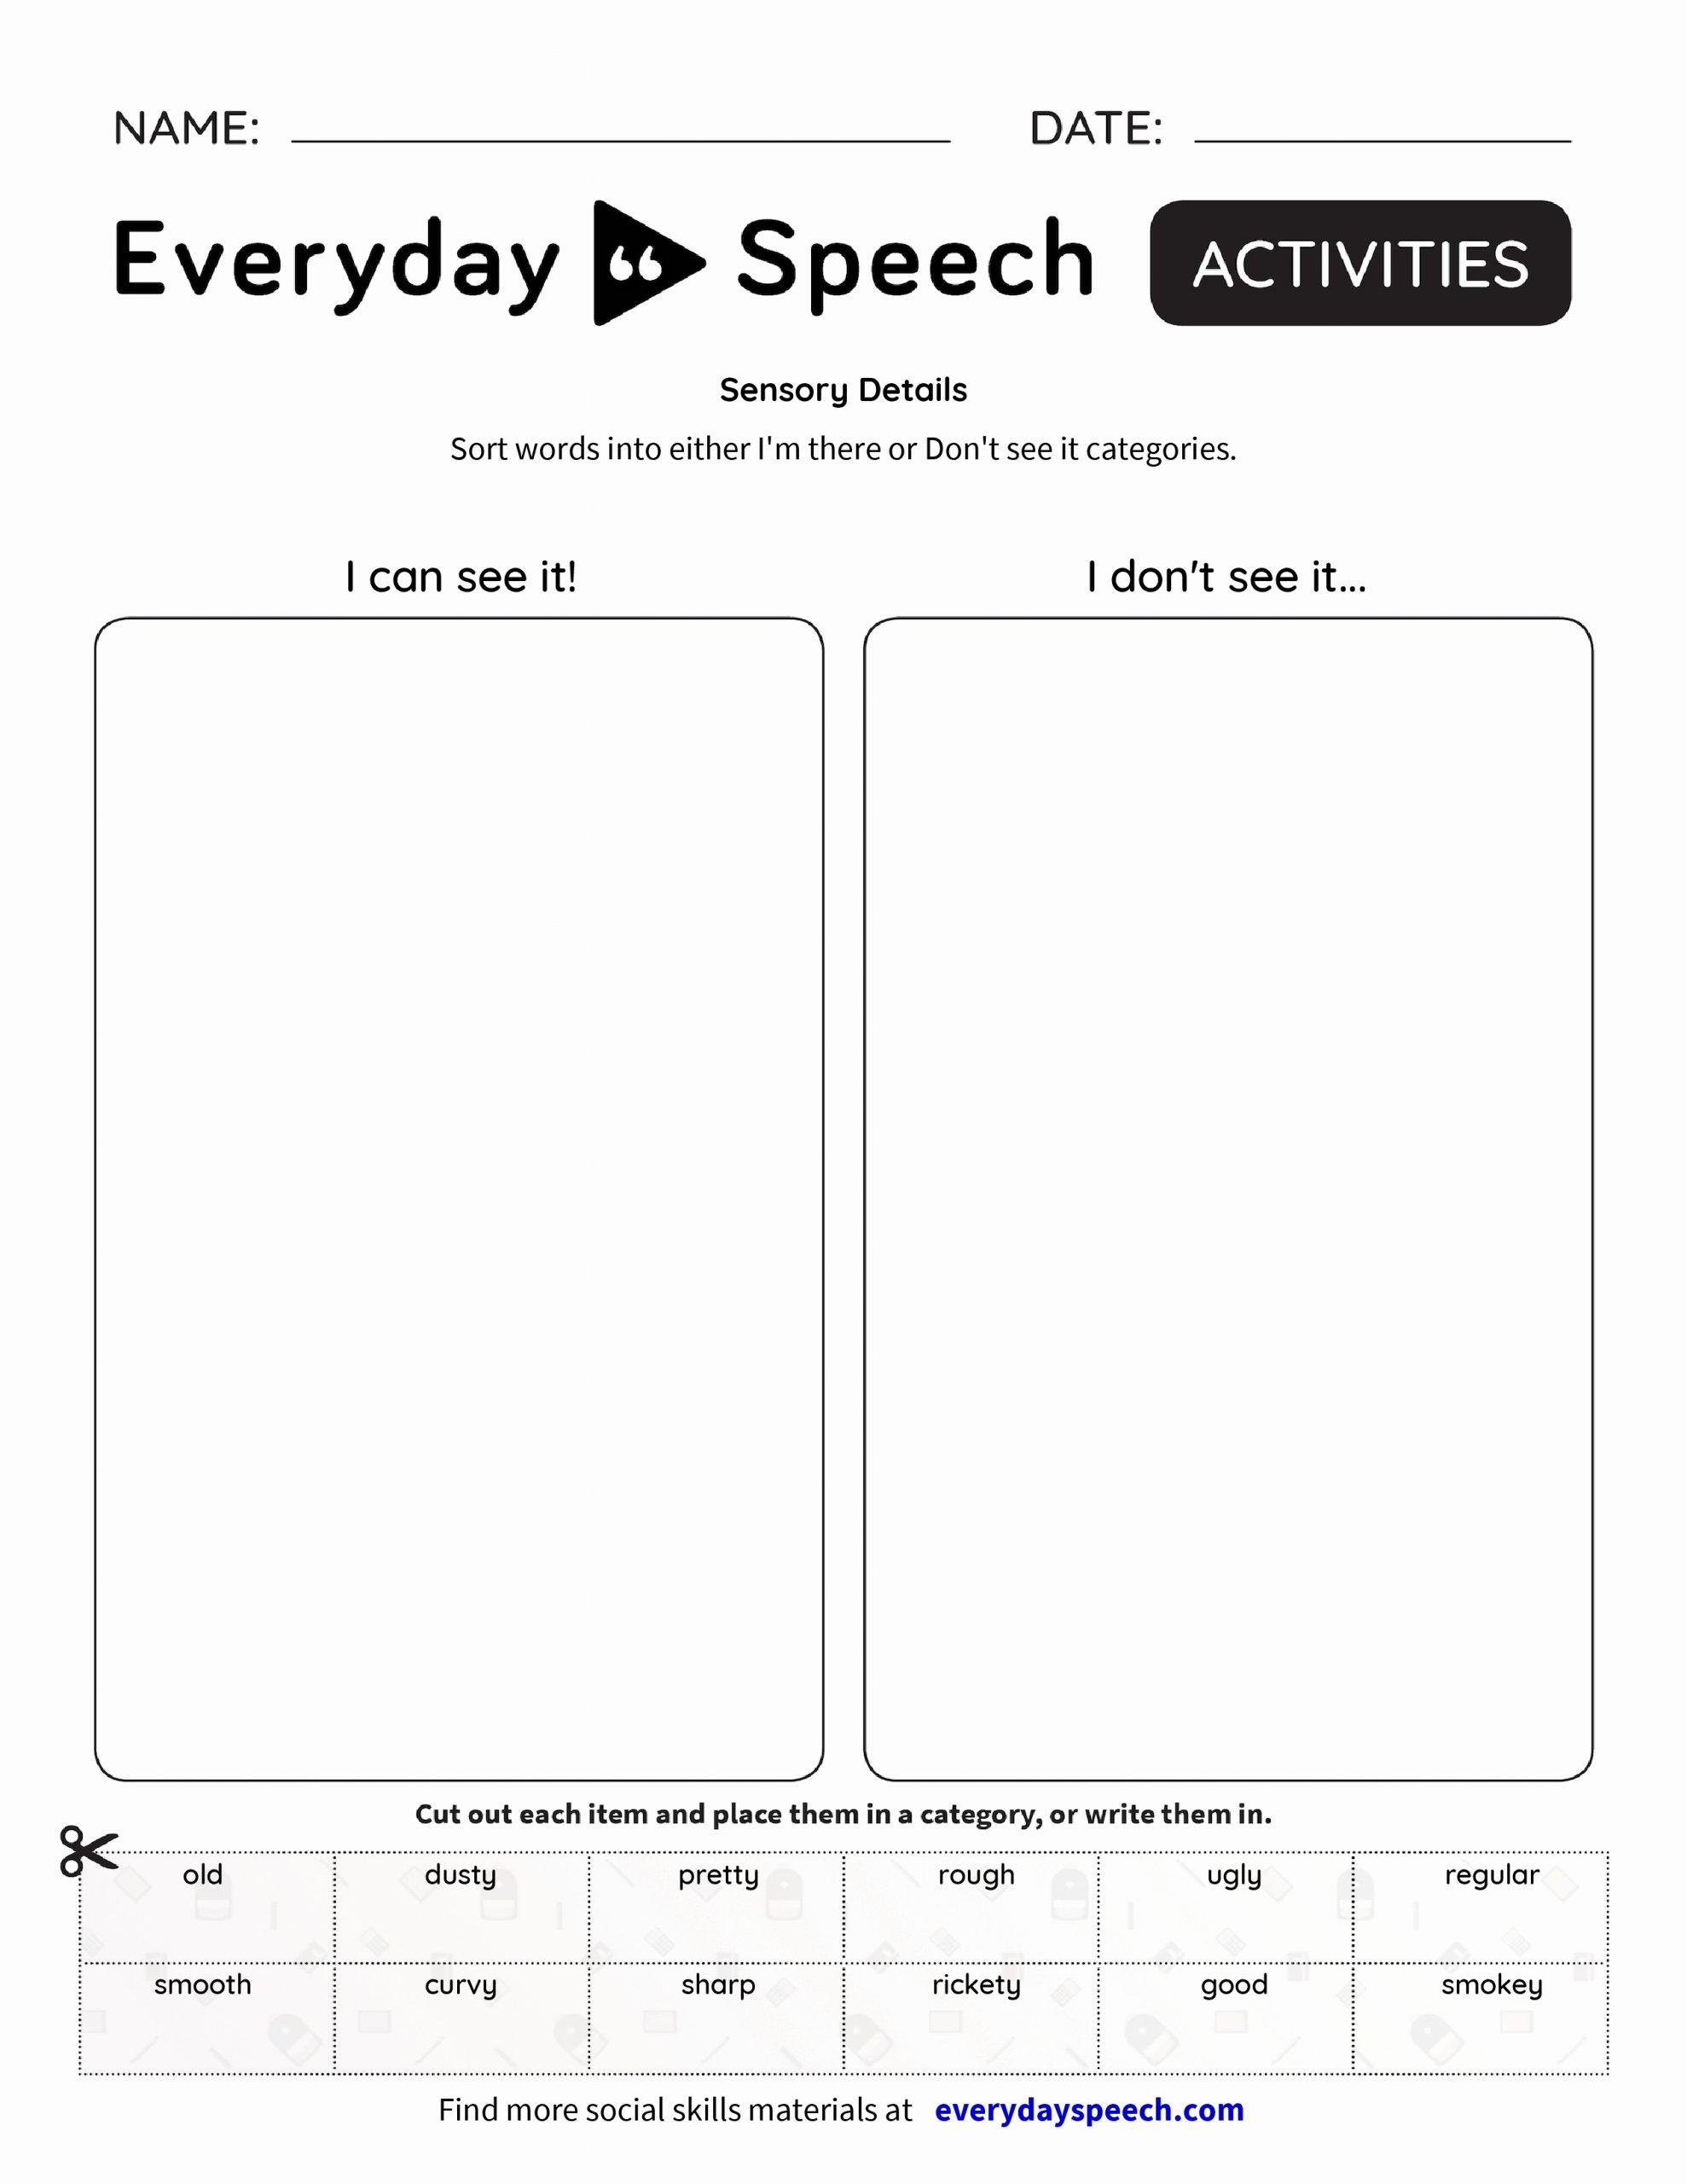 Sensory Detail Worksheet Fresh Sensory Details Everyday Speech Everyday Speech